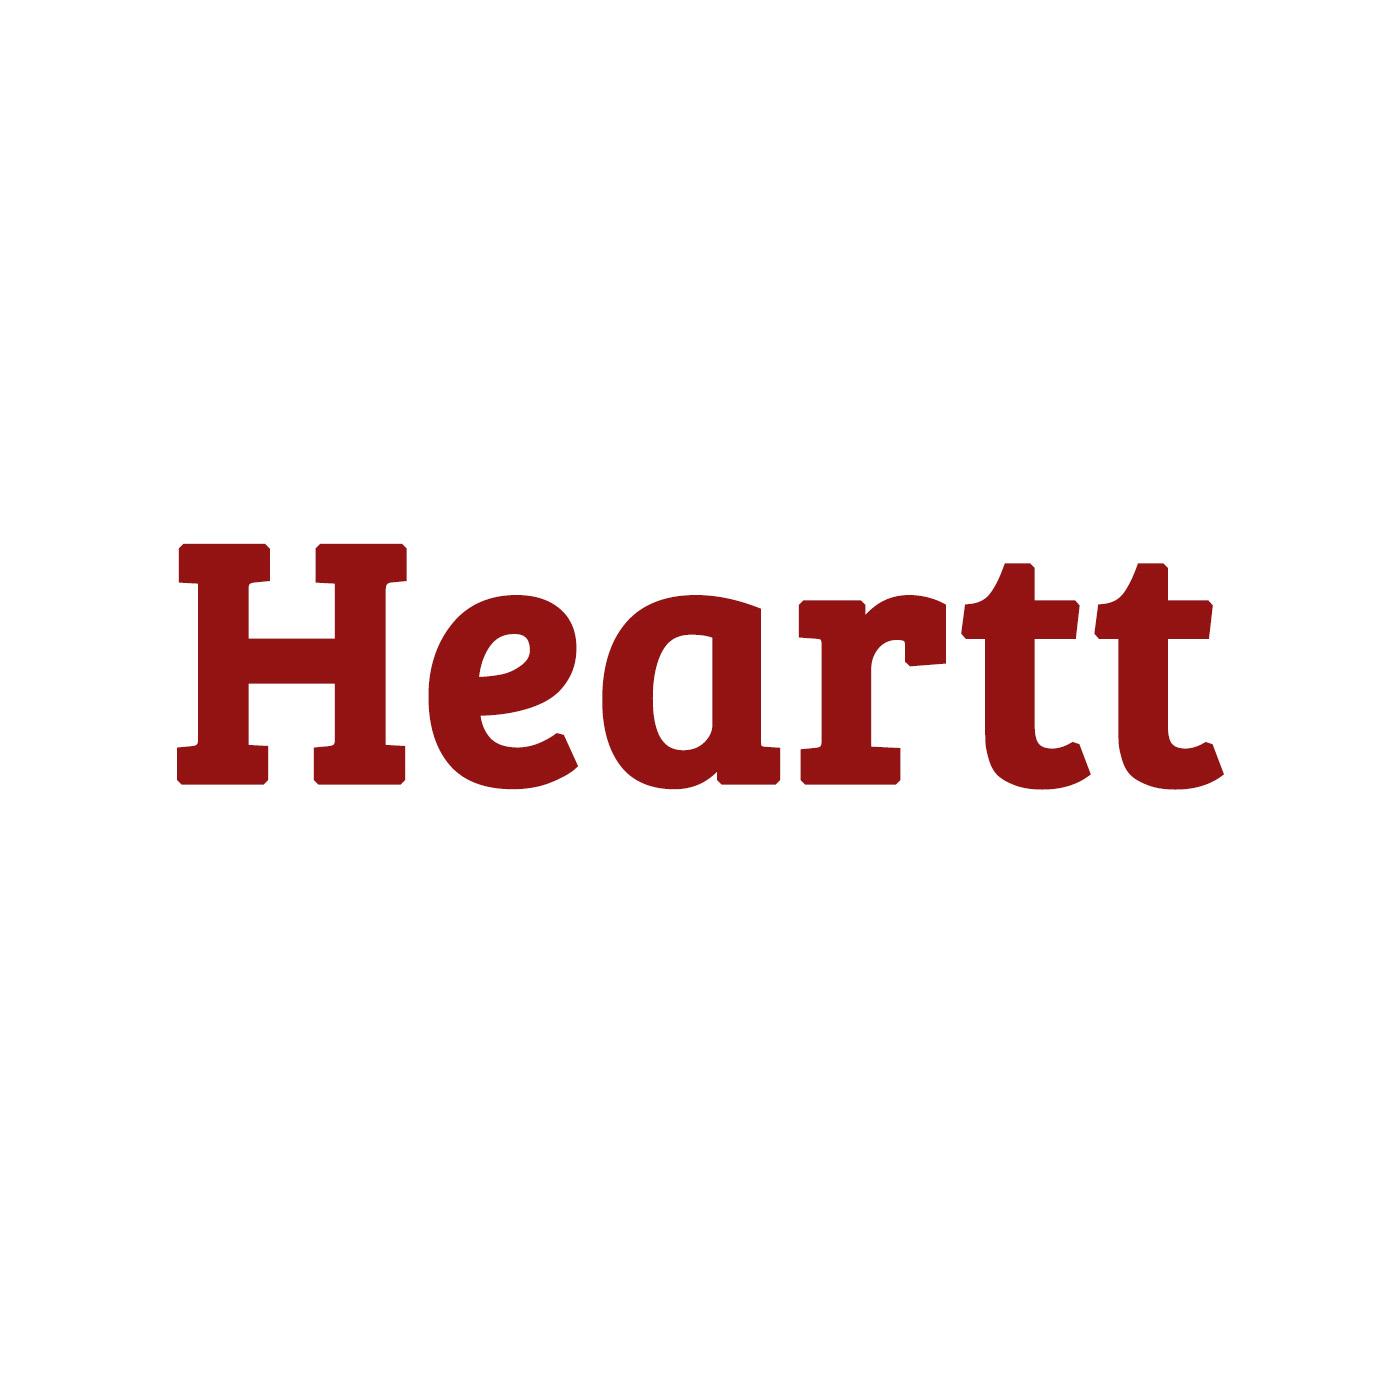 heartt non-profit shirley crawford